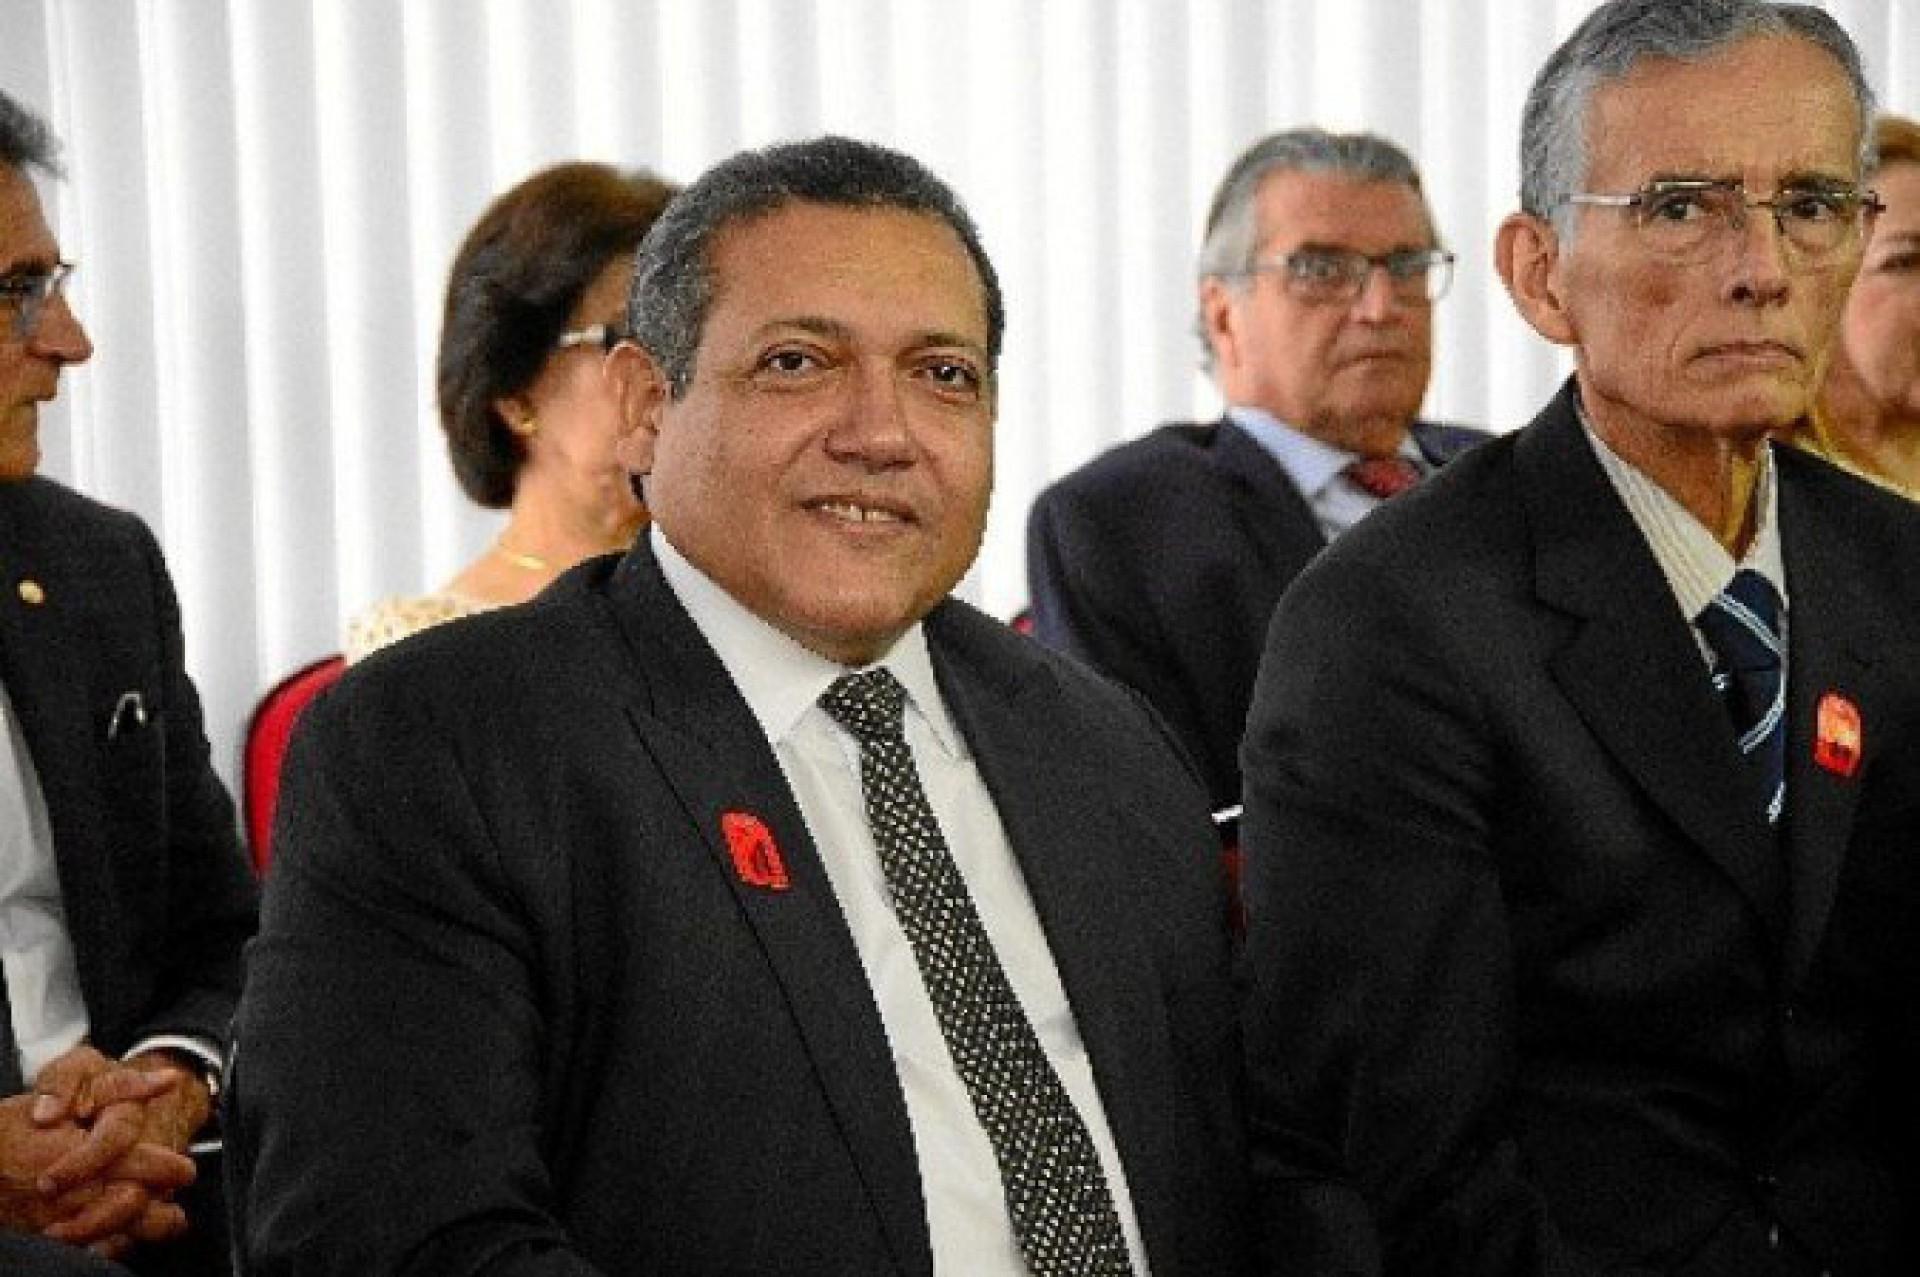 Voto de minerva está com Kássio Nunes